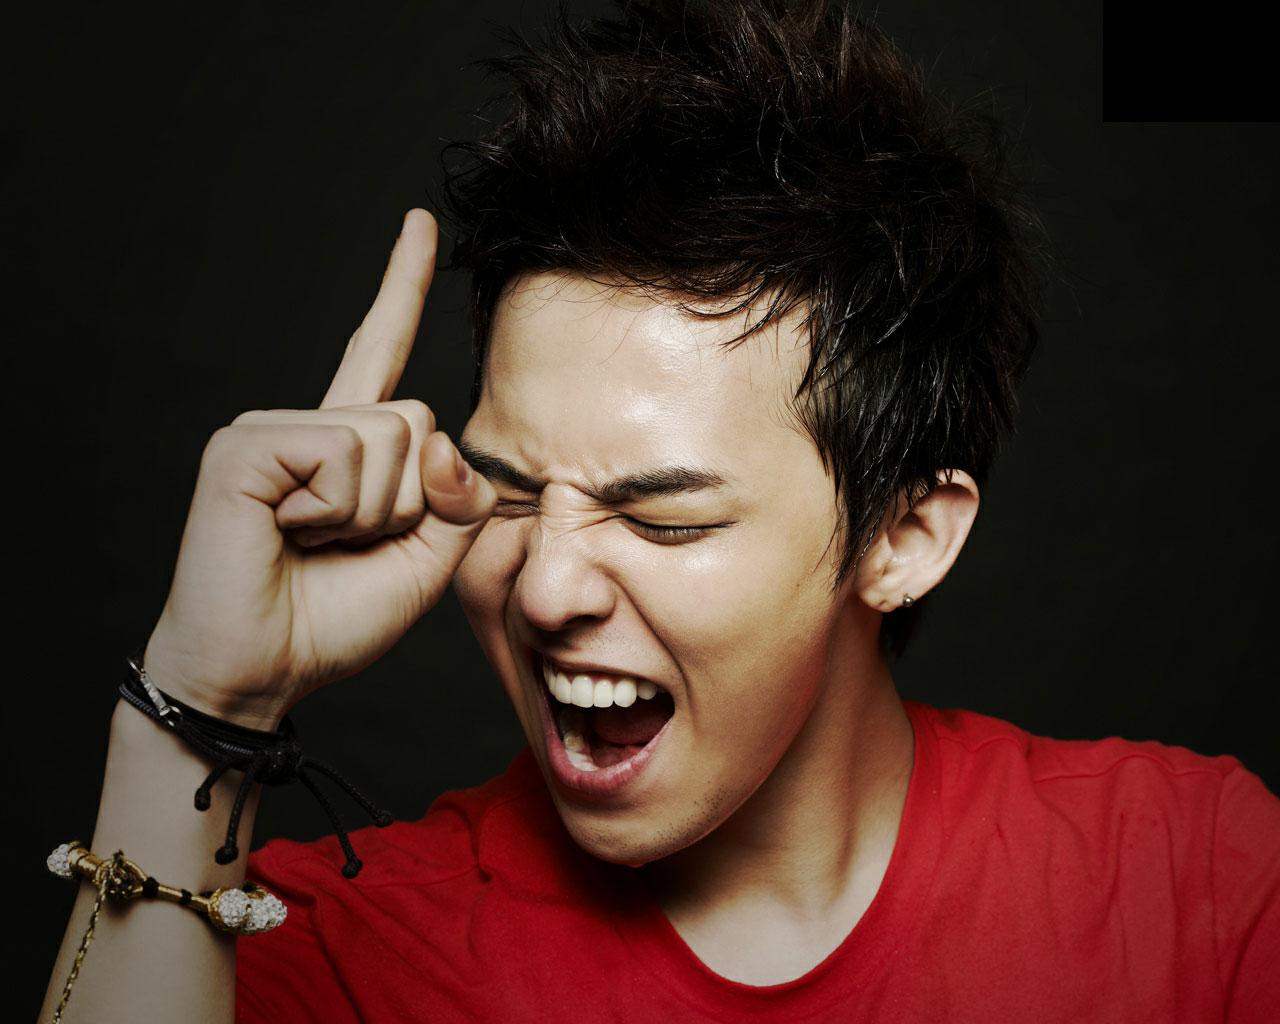 G-Dragon, Kangta, BEAST's Yong Jun Hyung Make Astounding Figures from Royalties